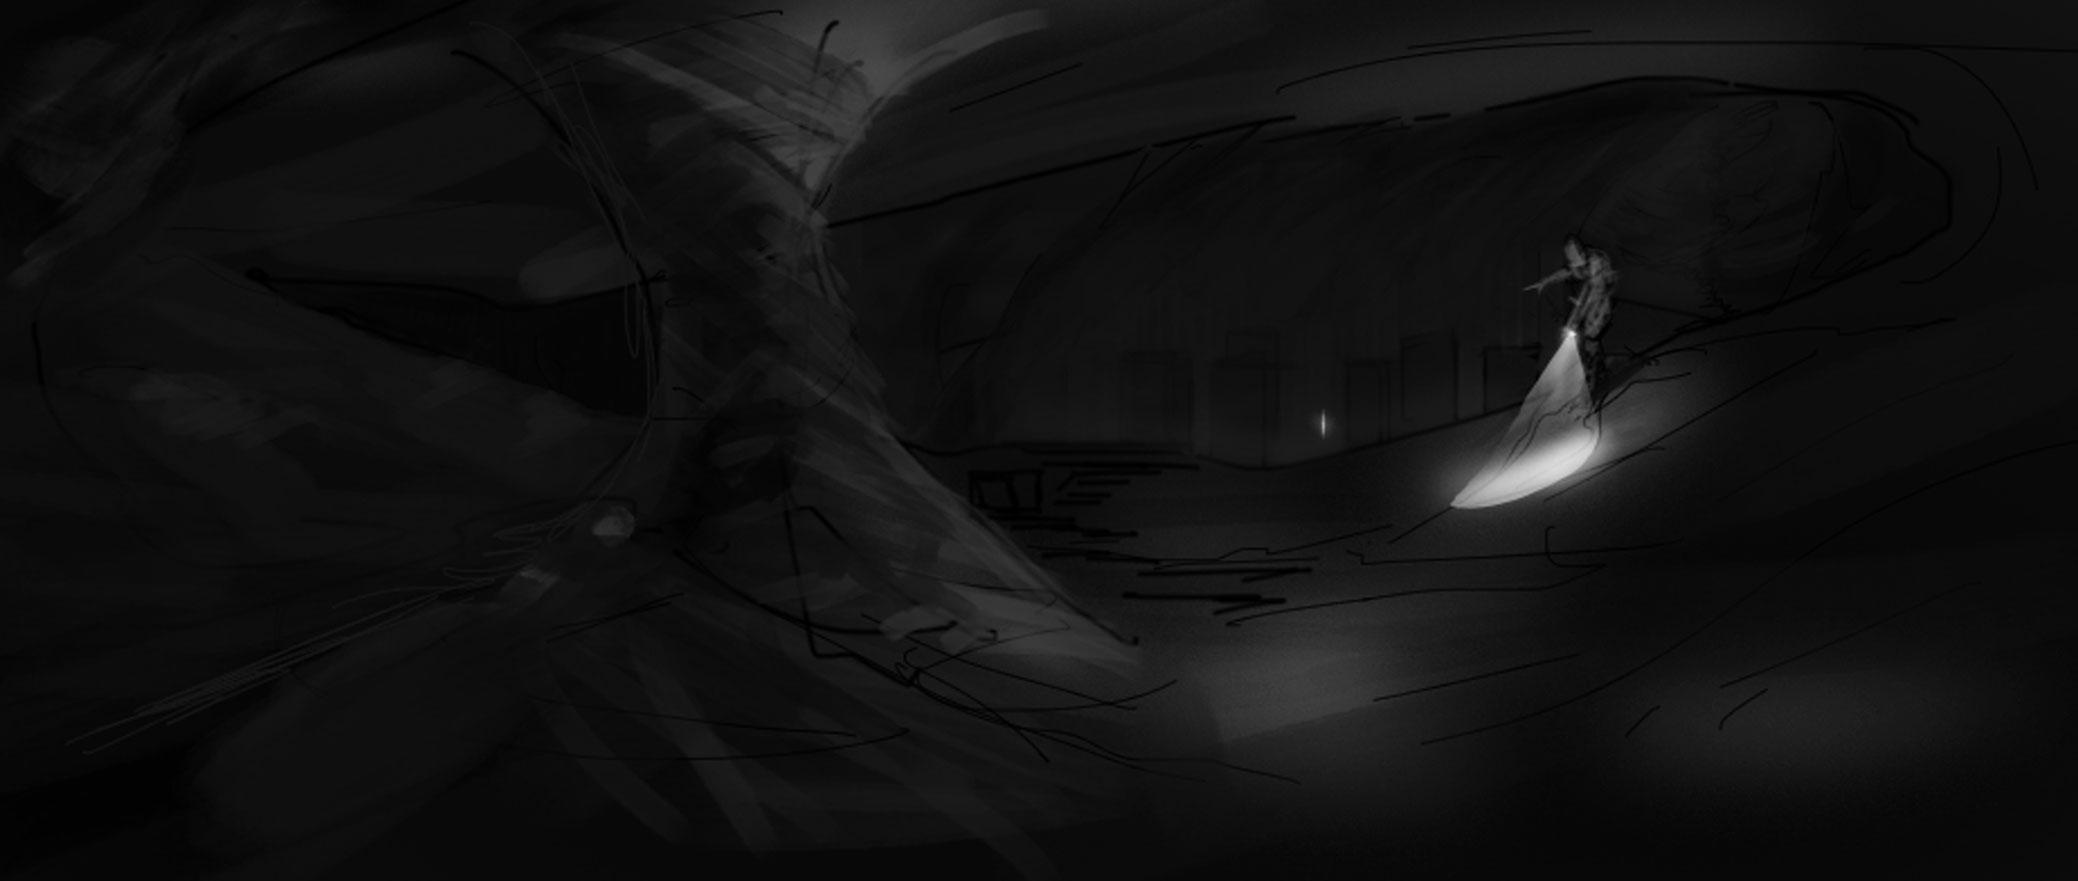 Wraiths_2019Animatic_Thumbsheet-02_65.jpg